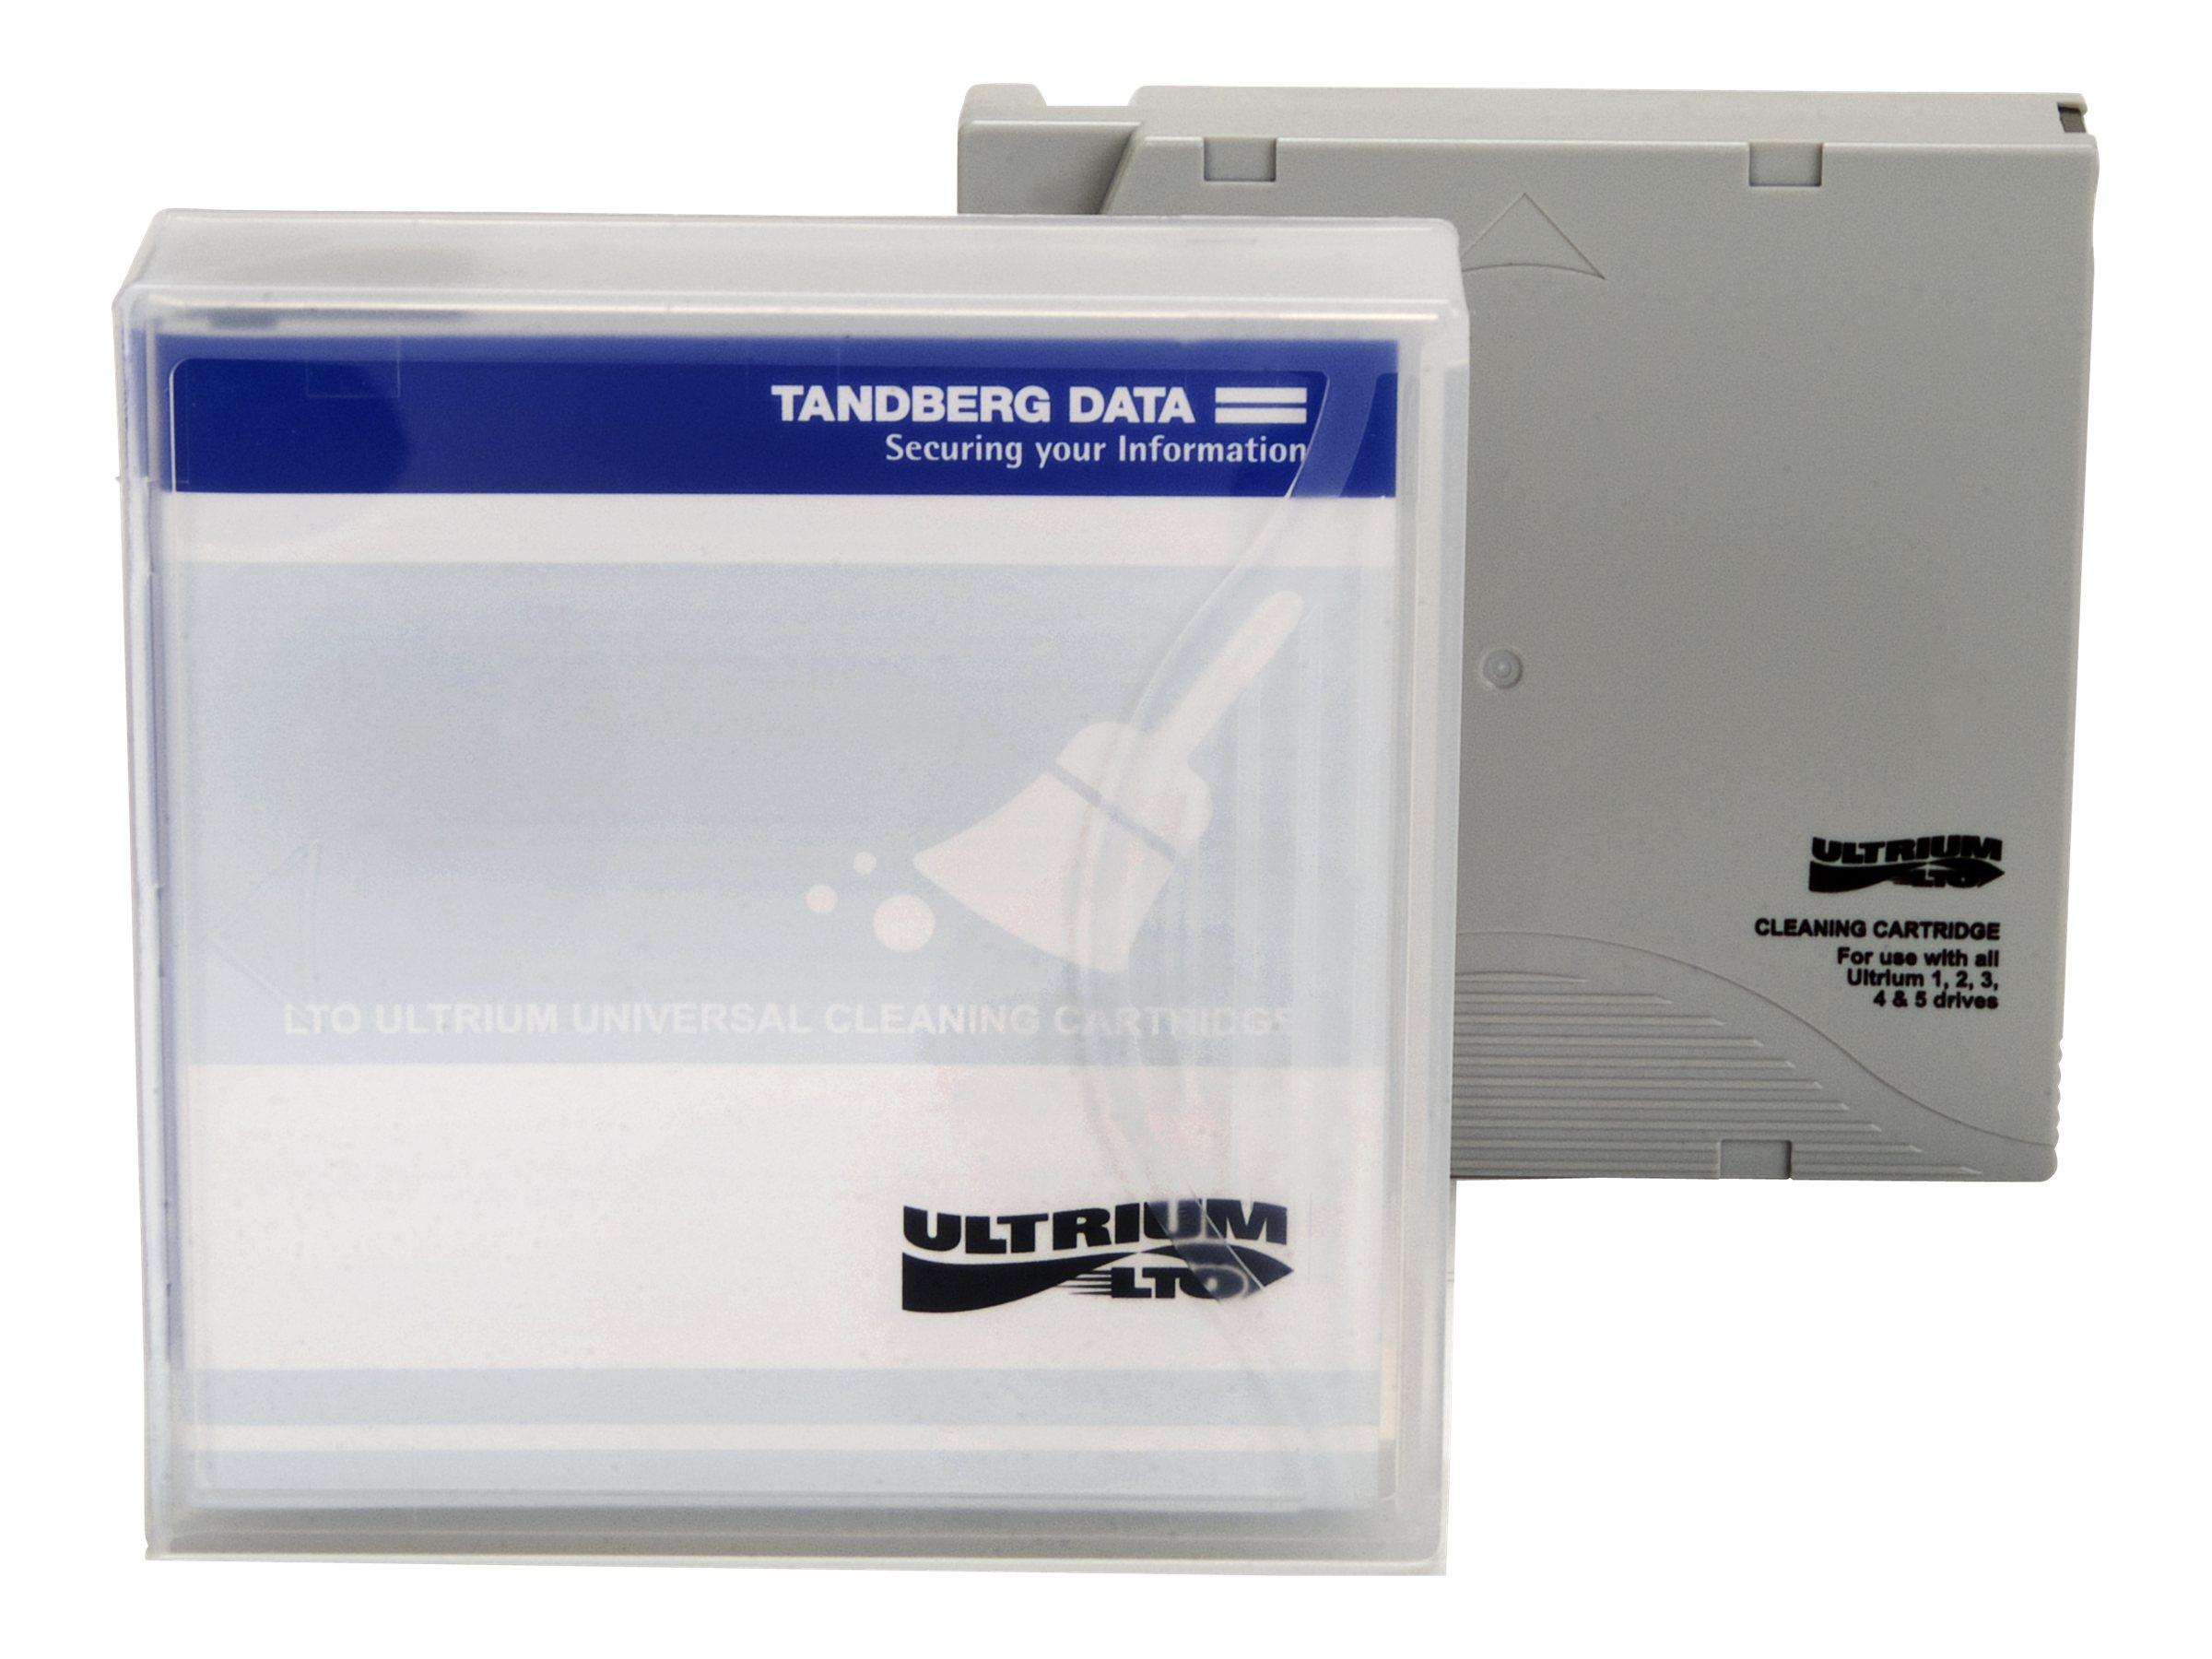 Overland-Tandberg LTO Ultrium - Reinigungskassette